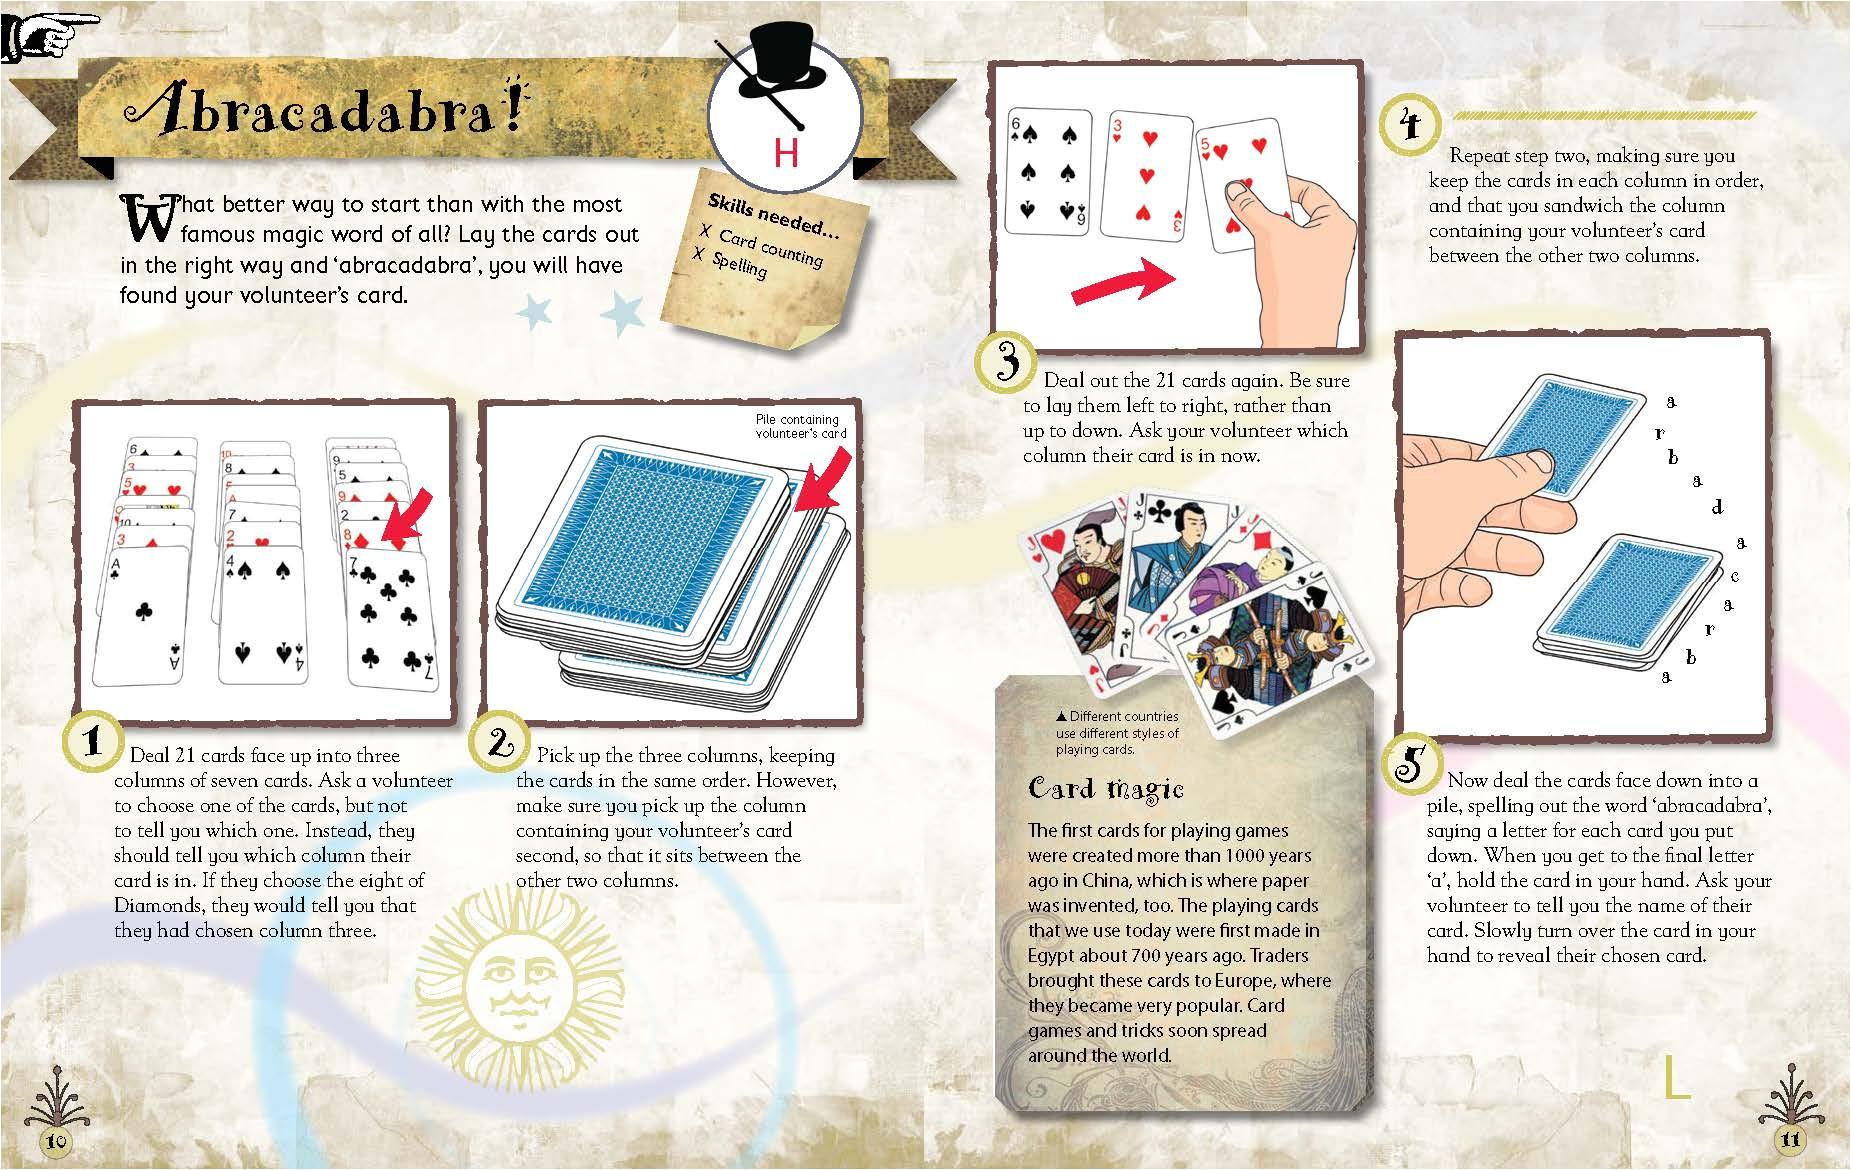 demystifying magic tricks